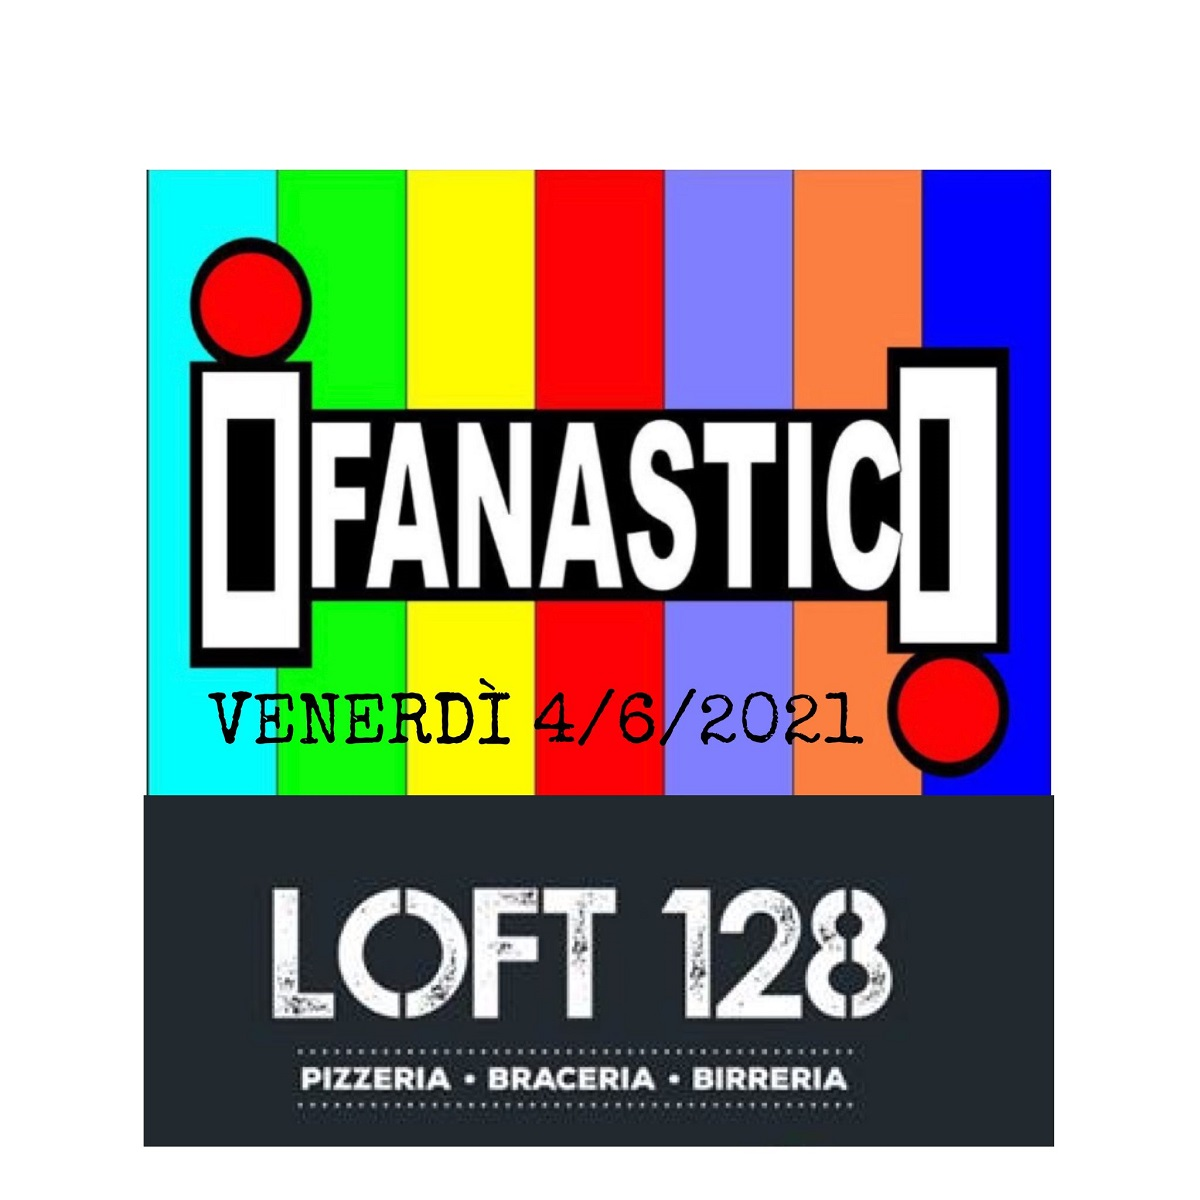 I Fanastici - live band venerdì 4 giugno 2021 al Loft 128 locandina